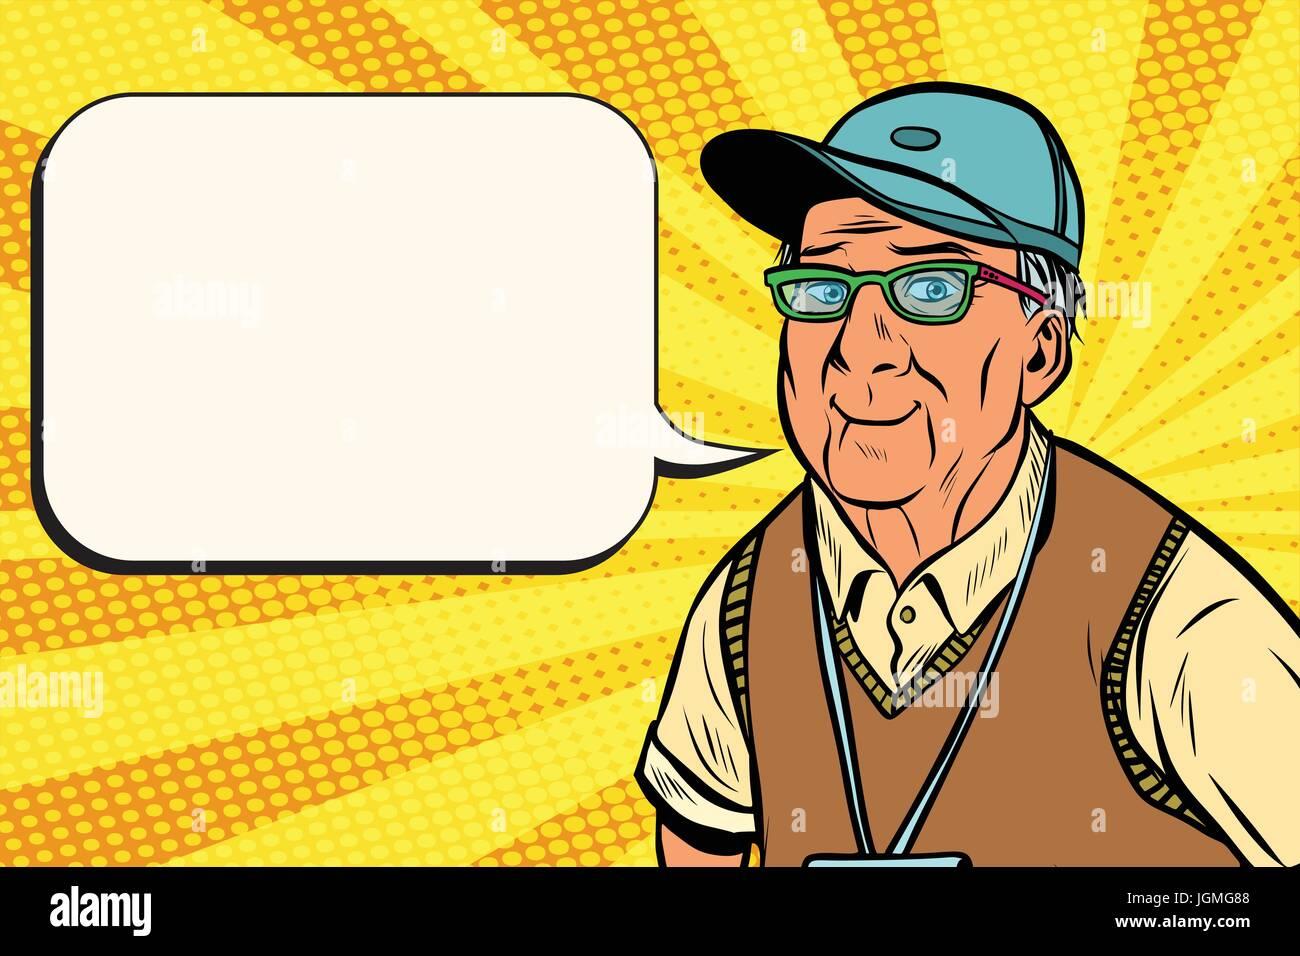 joyful old man in a baseball cap - Stock Vector